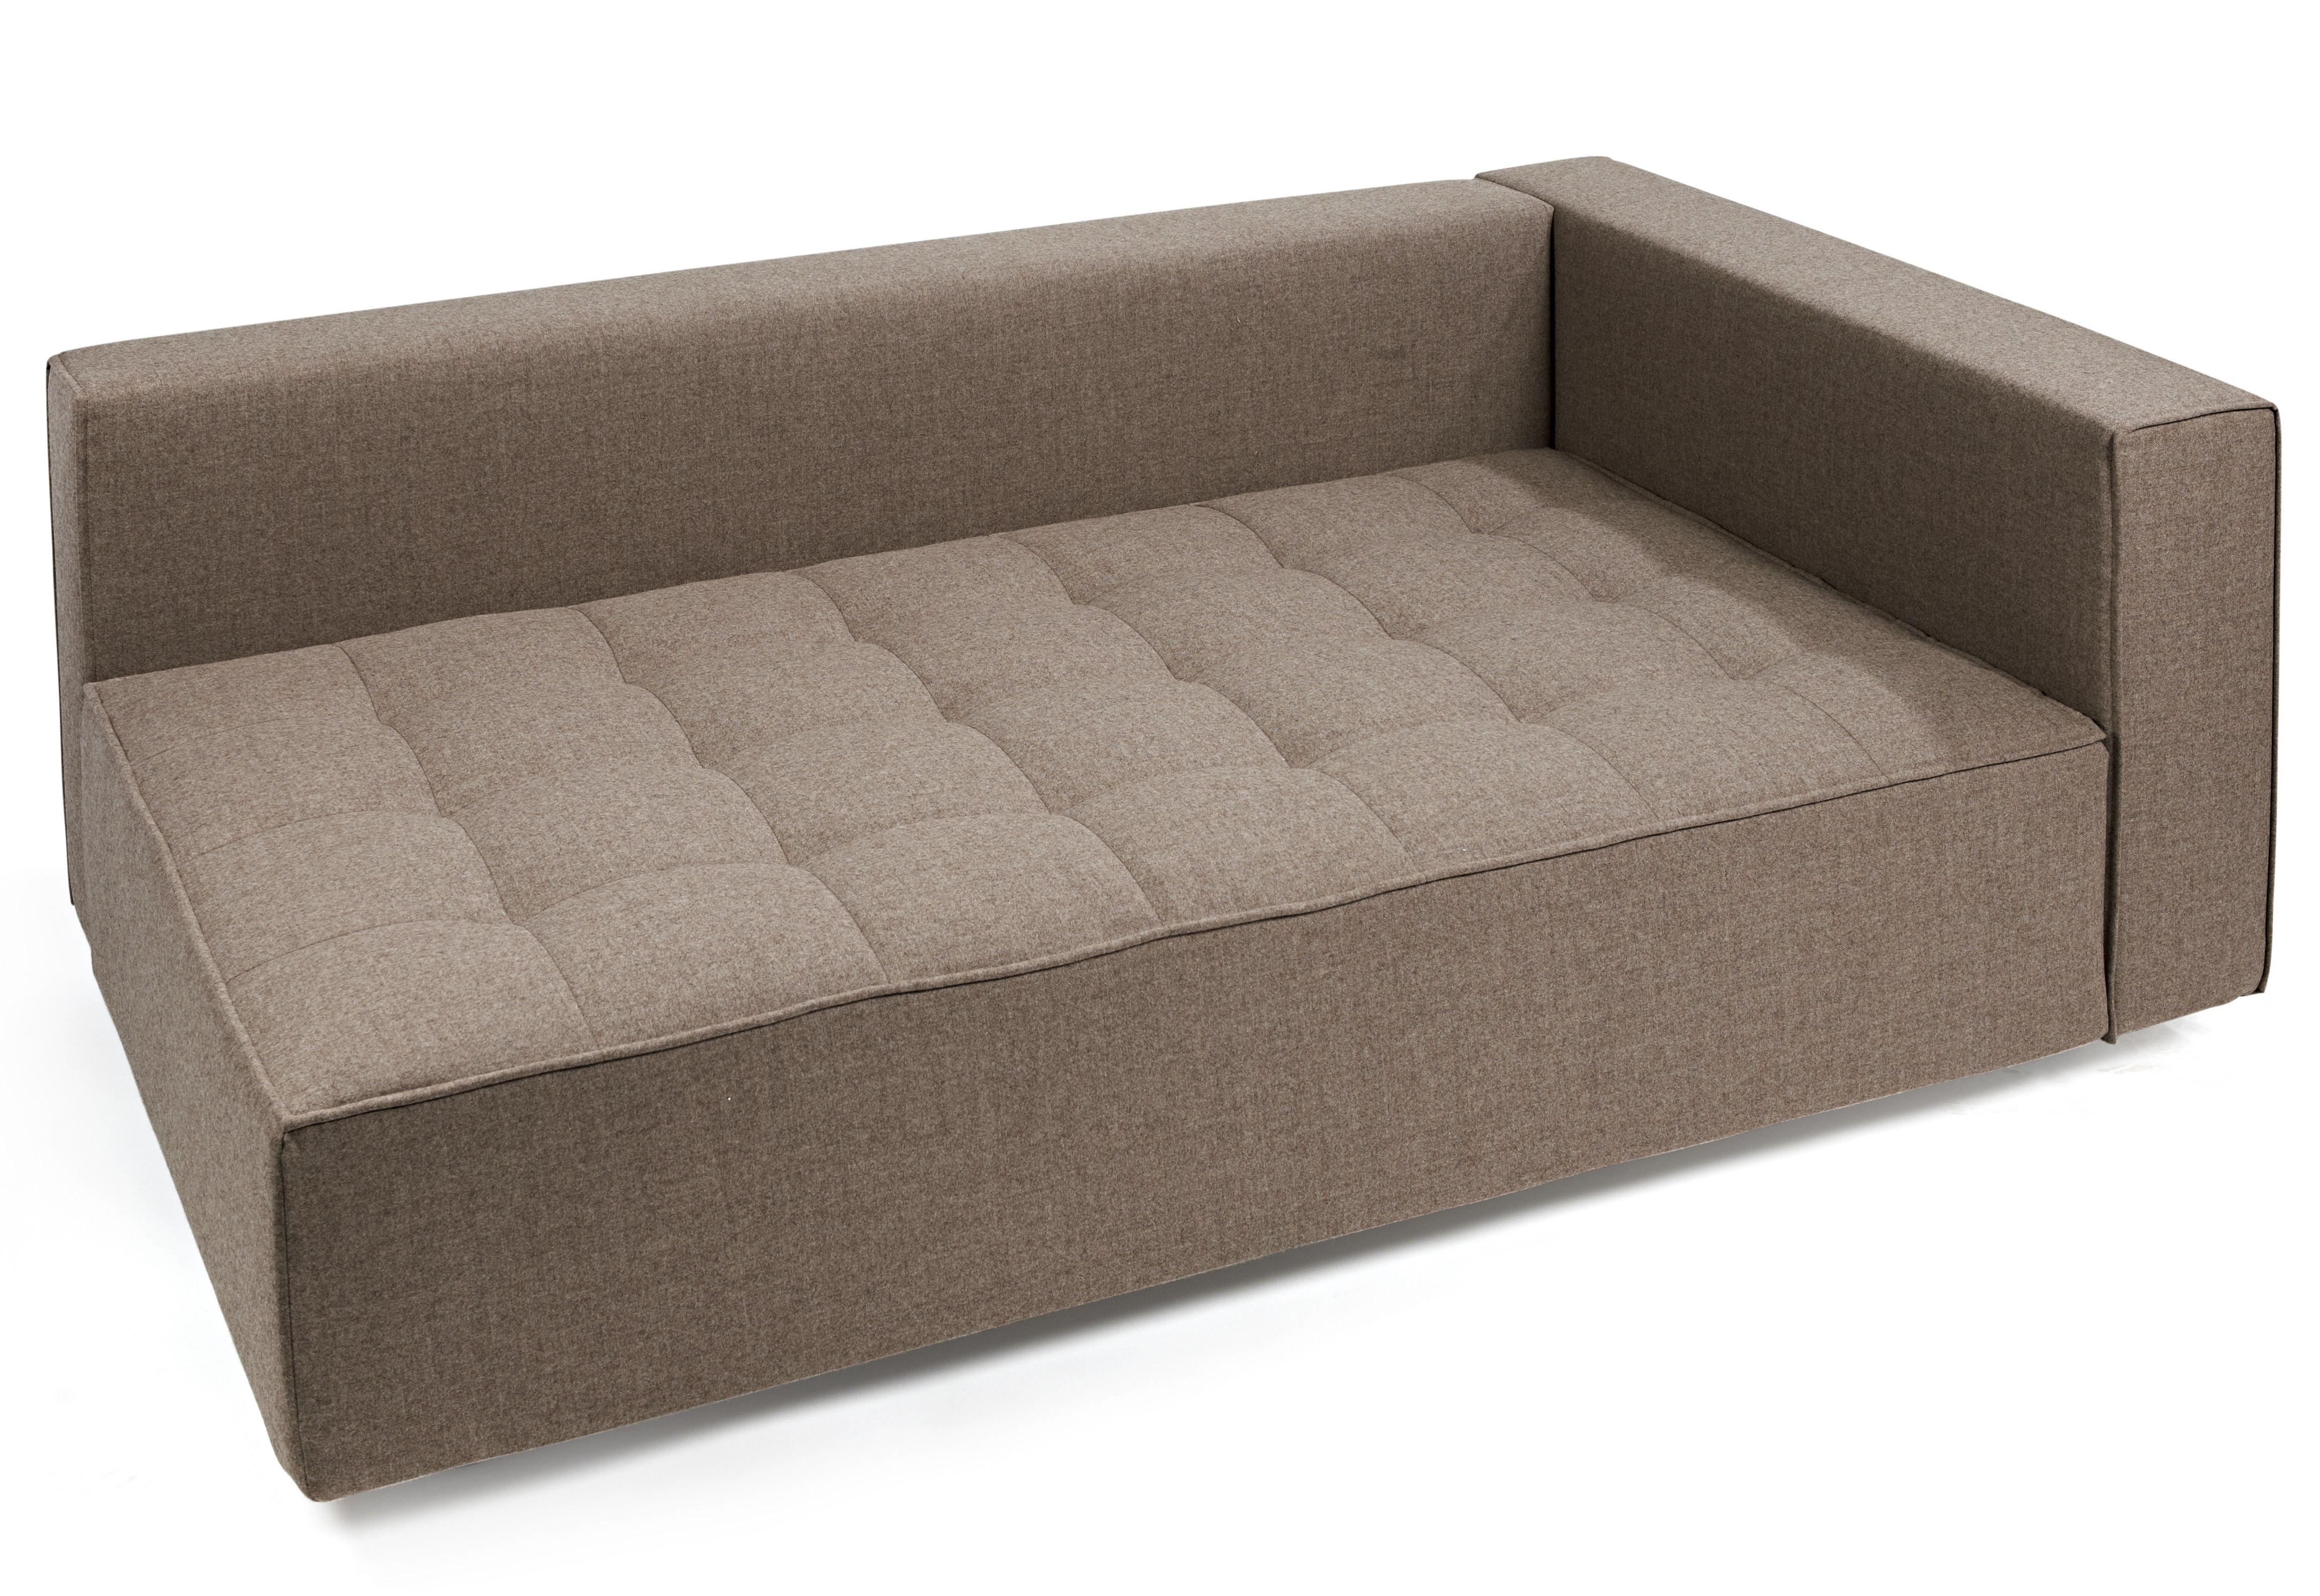 Kilt / Stoff - Armlehne rechts - L 172 cm   Zanotta   Sofa